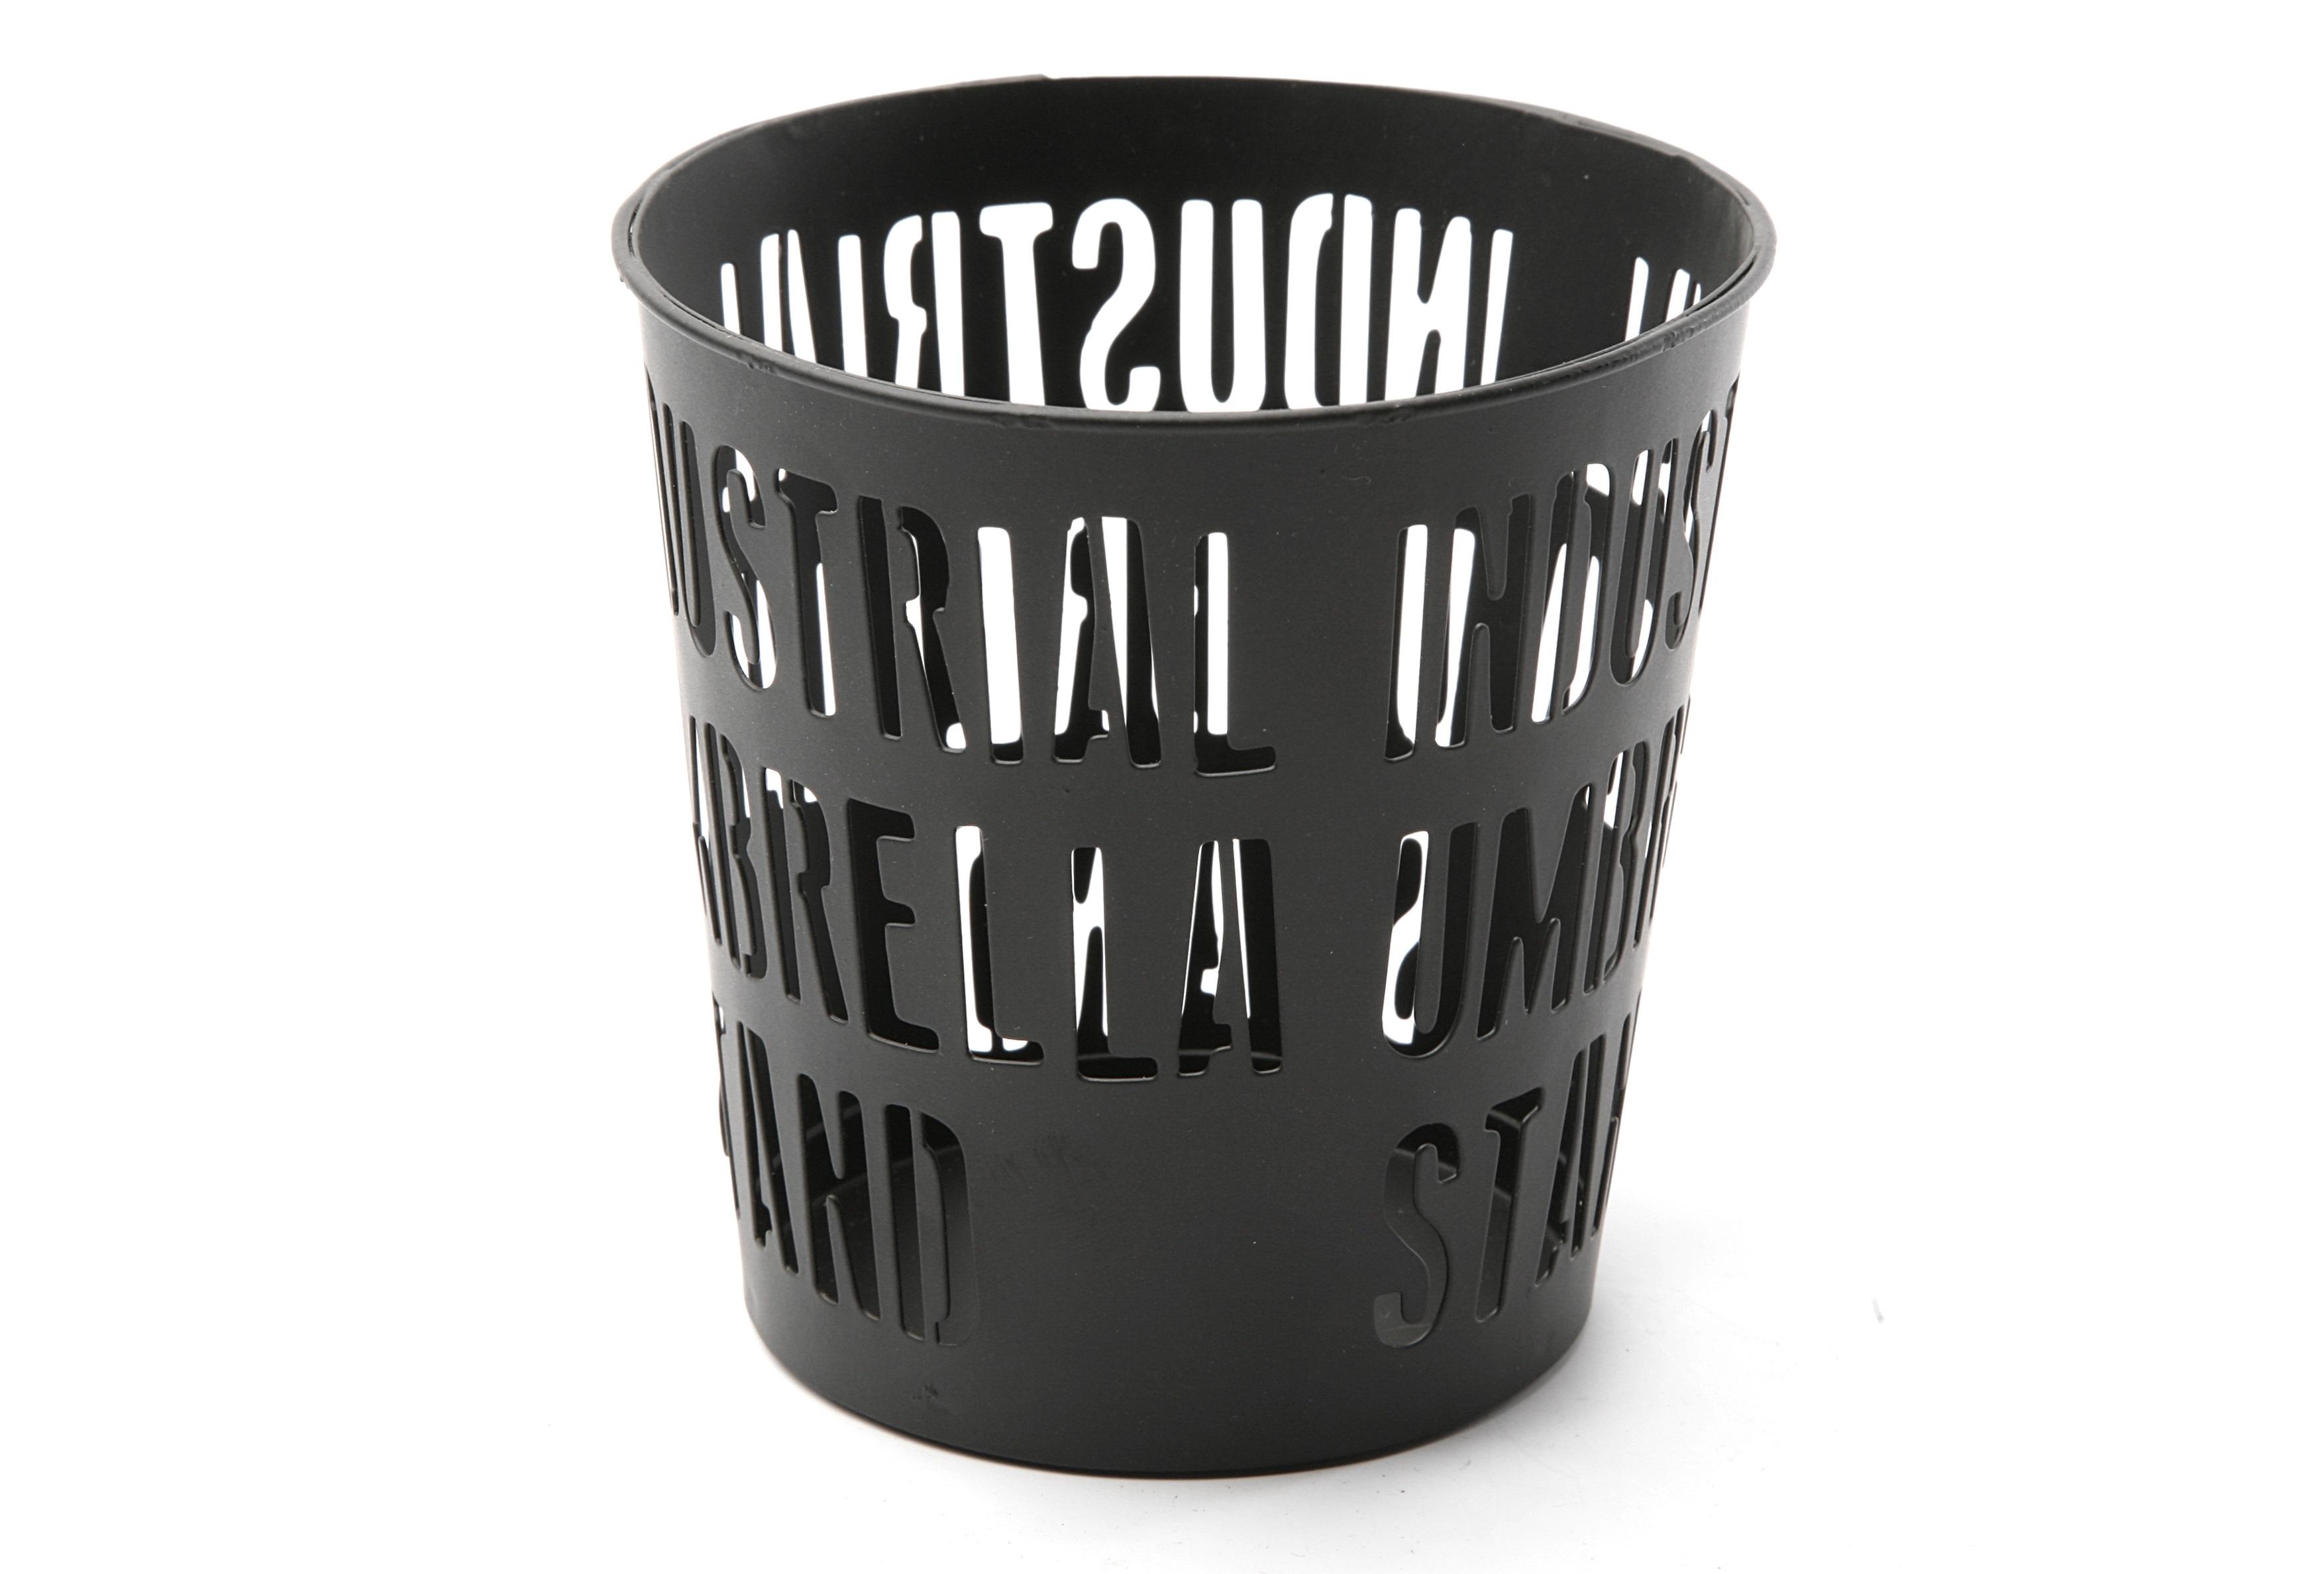 Стакан для карандашей LoftАксессуары для хранения бумаги и канцелярии<br><br><br>Material: Металл<br>Length см: None<br>Width см: None<br>Height см: 11<br>Diameter см: 8